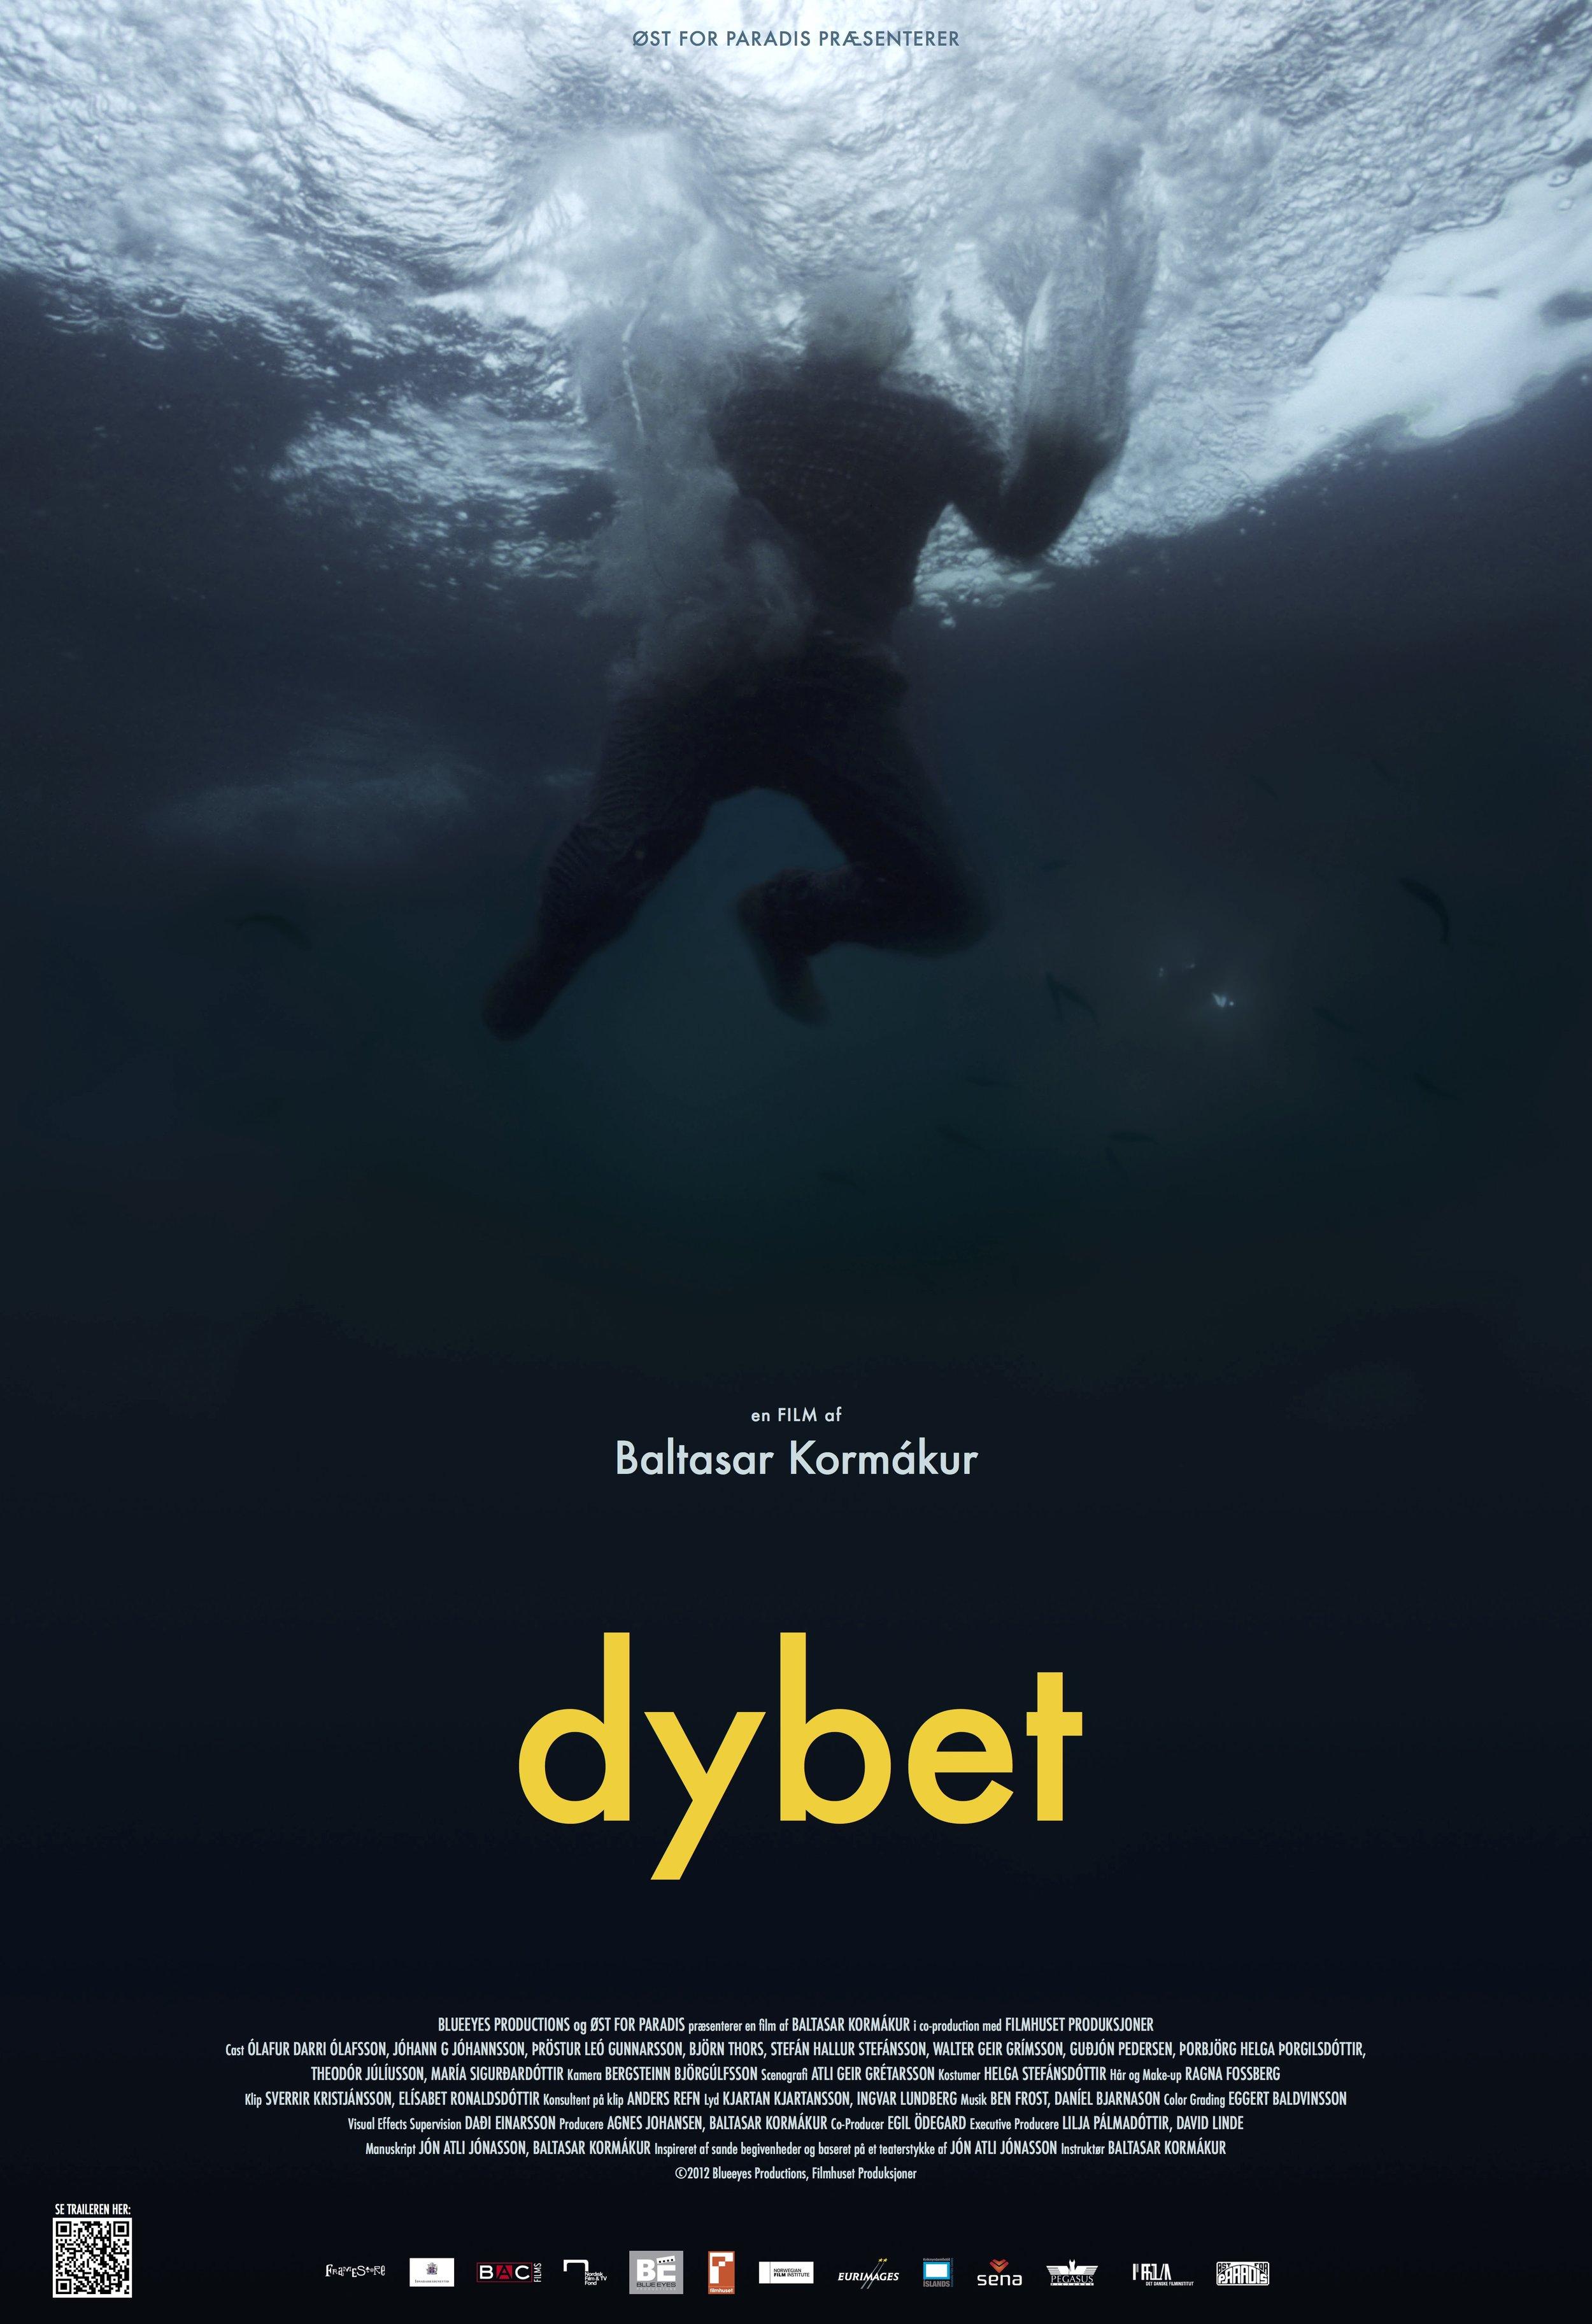 Dybet